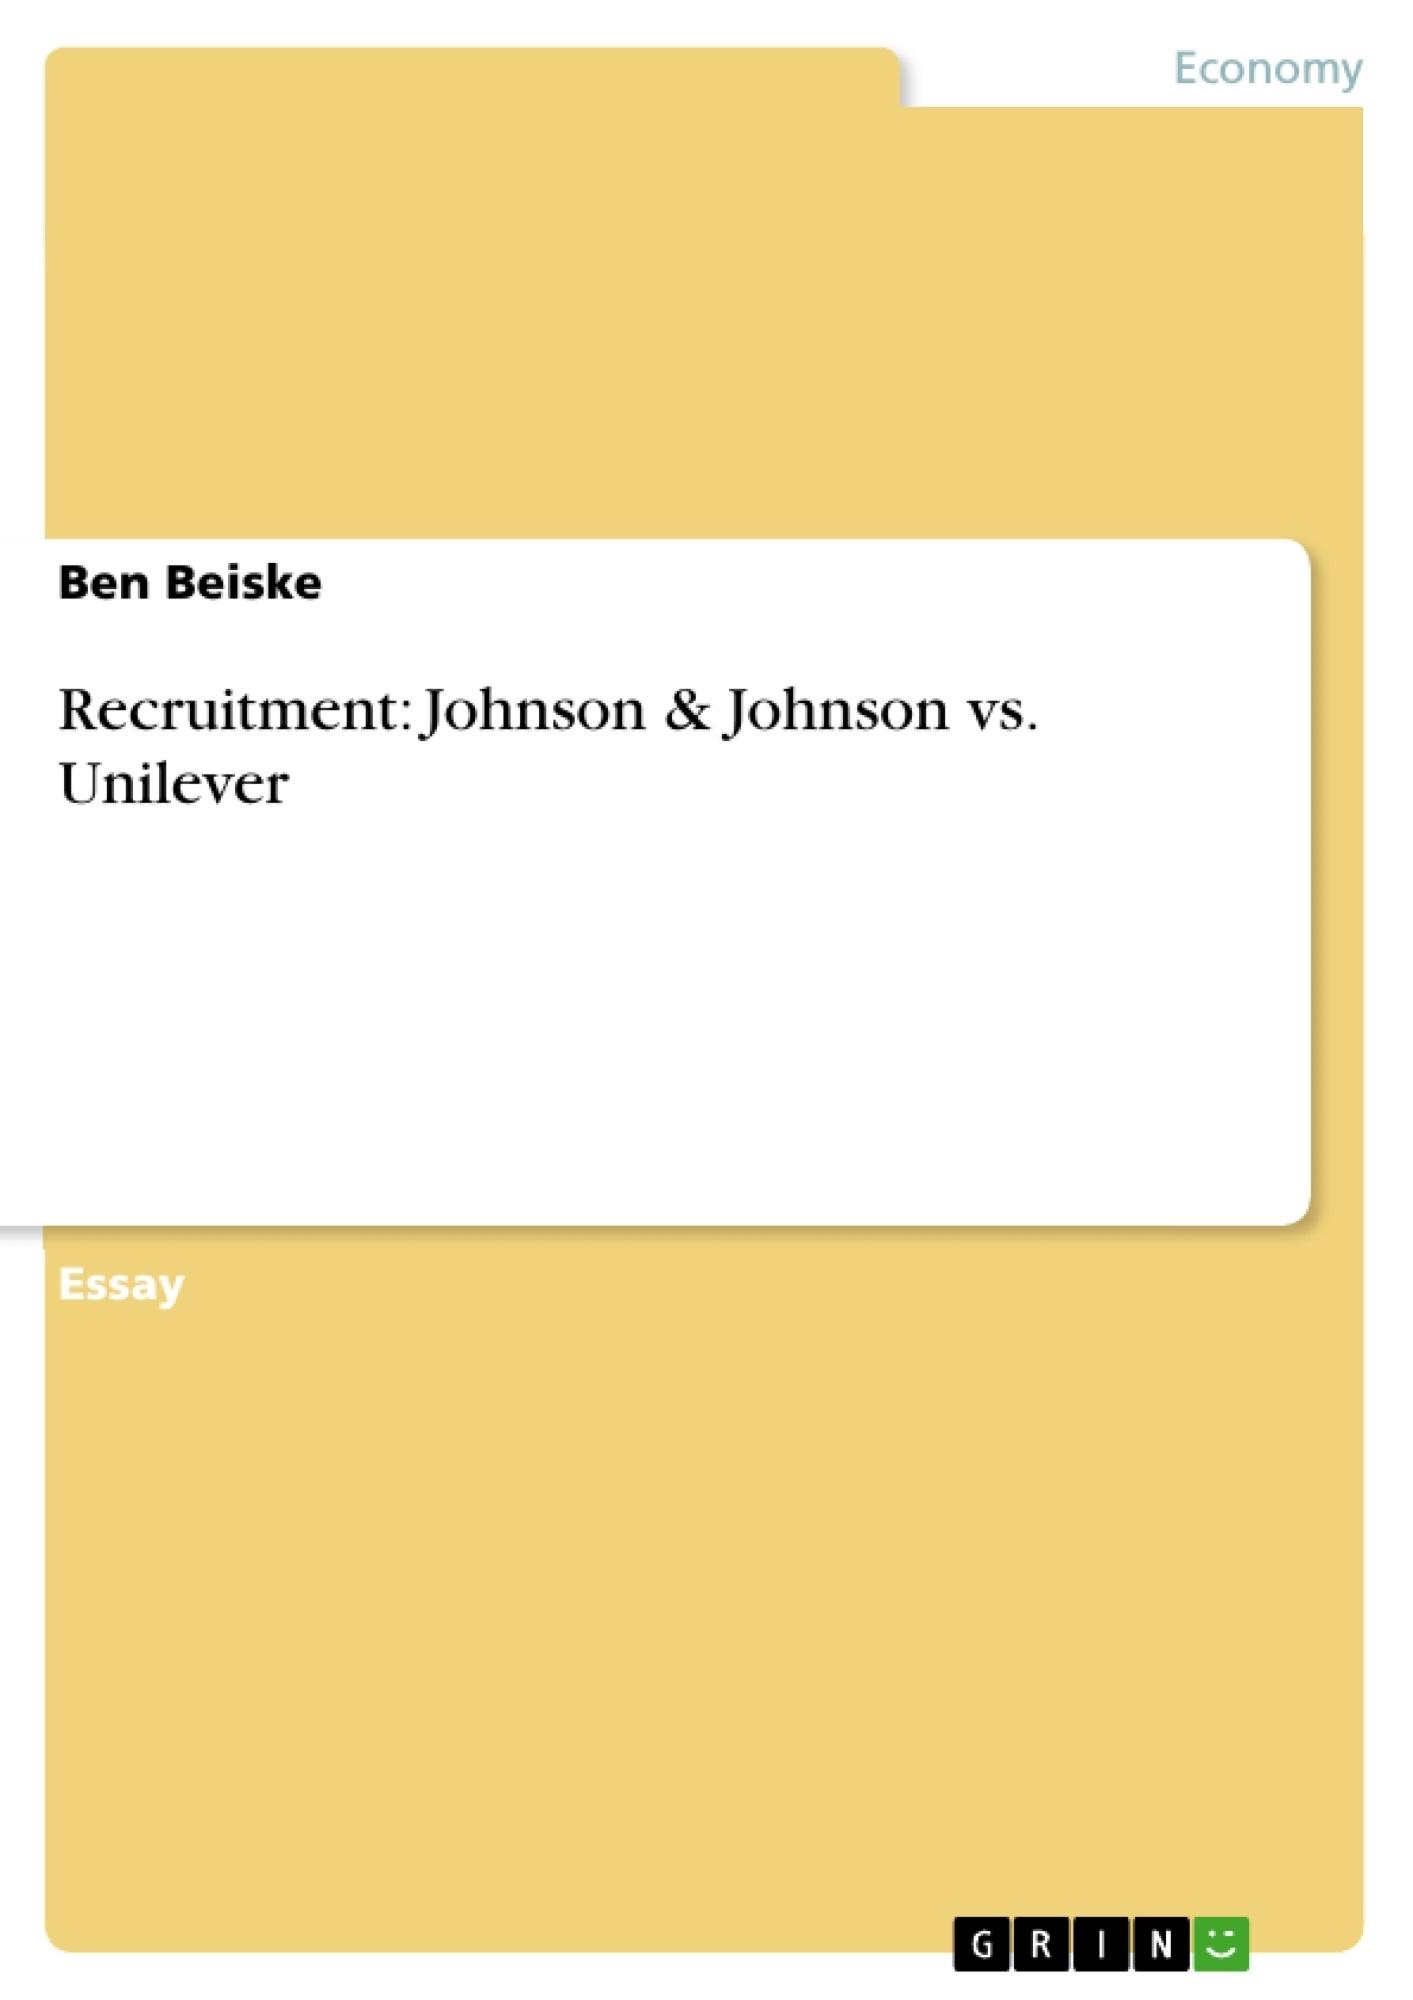 Title: Recruitment: Johnson & Johnson vs. Unilever